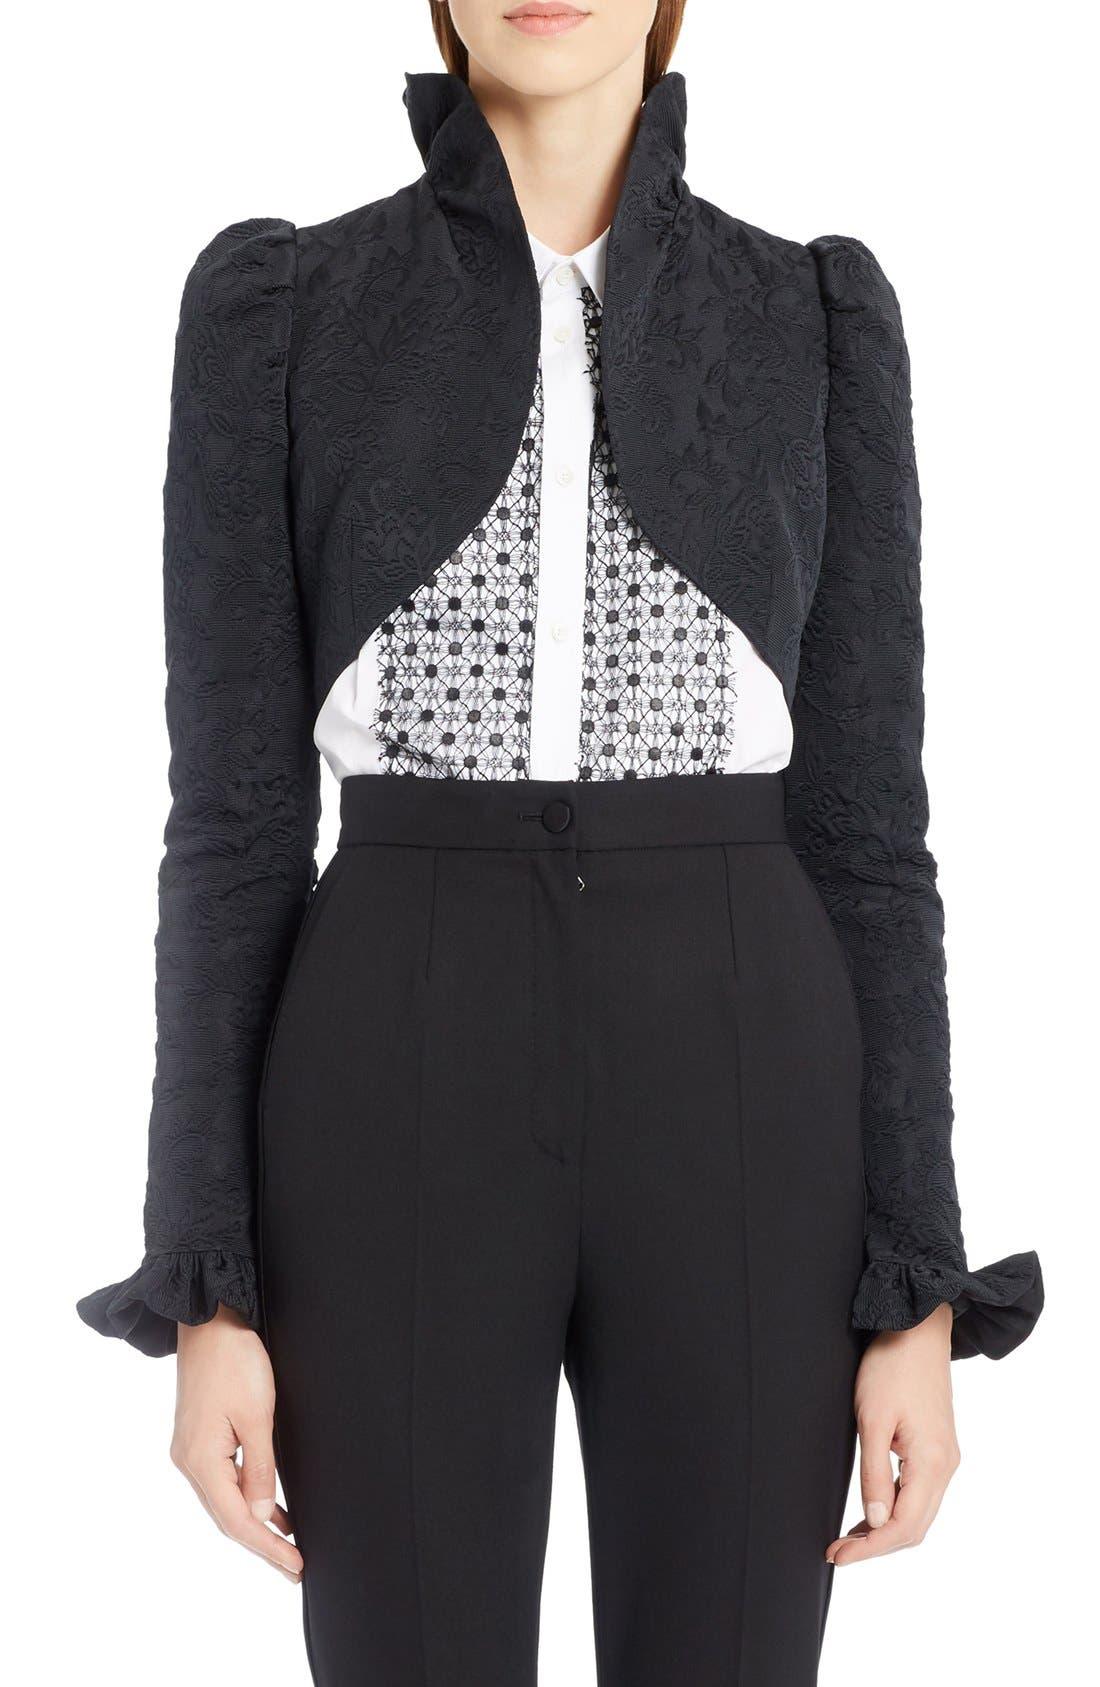 Main Image - Dolce&Gabbana Ruffle Jacquard Bolero Jacket